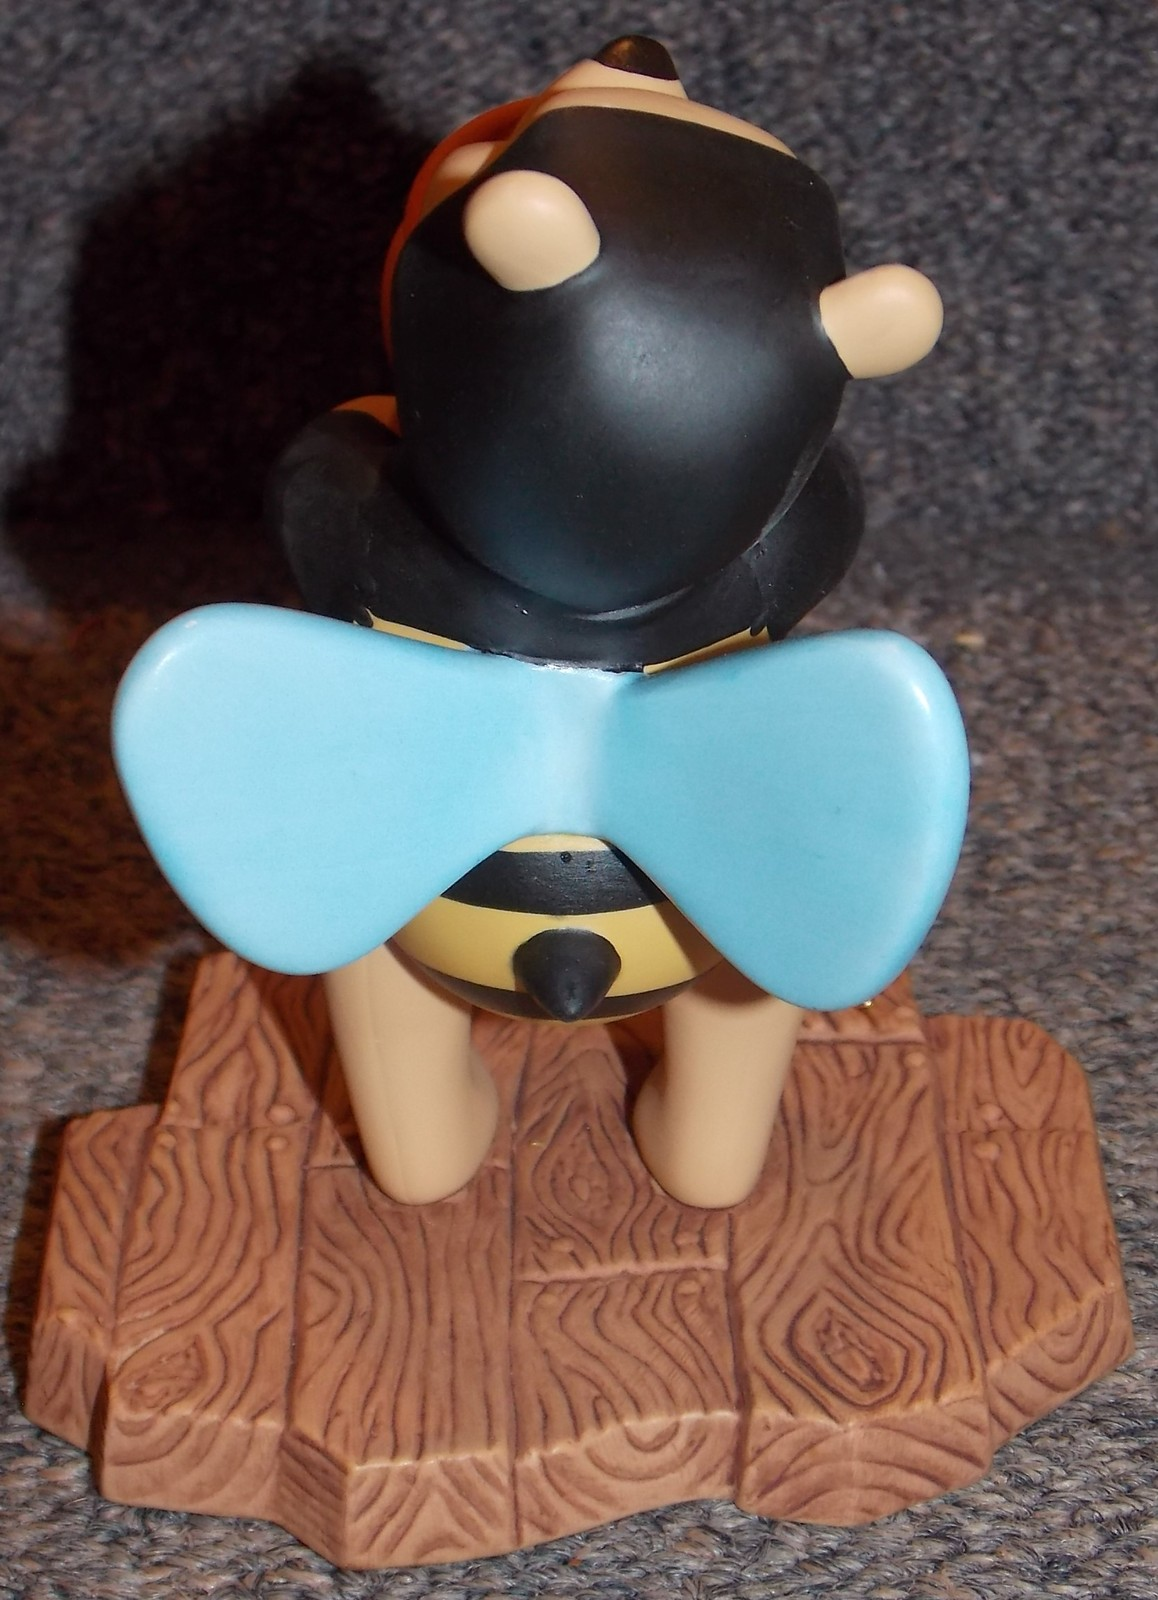 Disney Winnie the Pooh Figurine New in Box Tricks And Treats